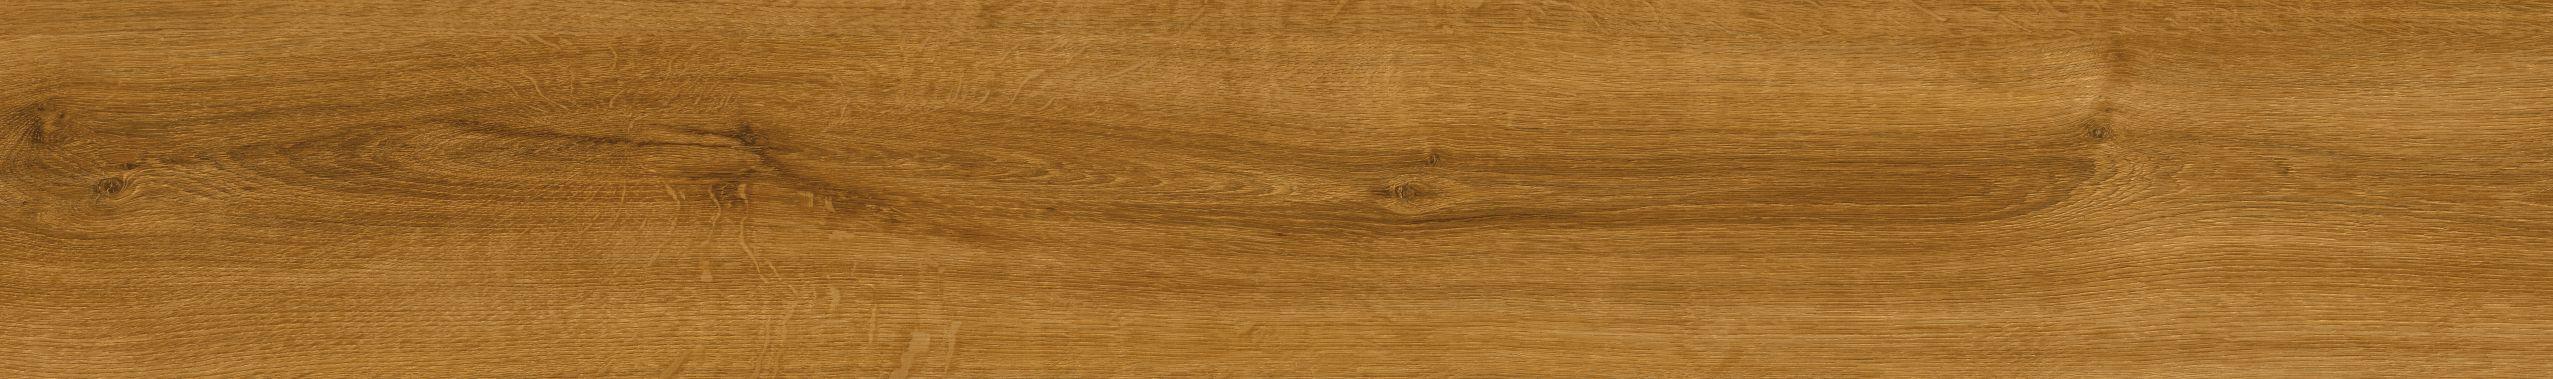 Panele winylowe LVT modulari ® WOOD DRYBACK 19,6 x 132 cm 24244